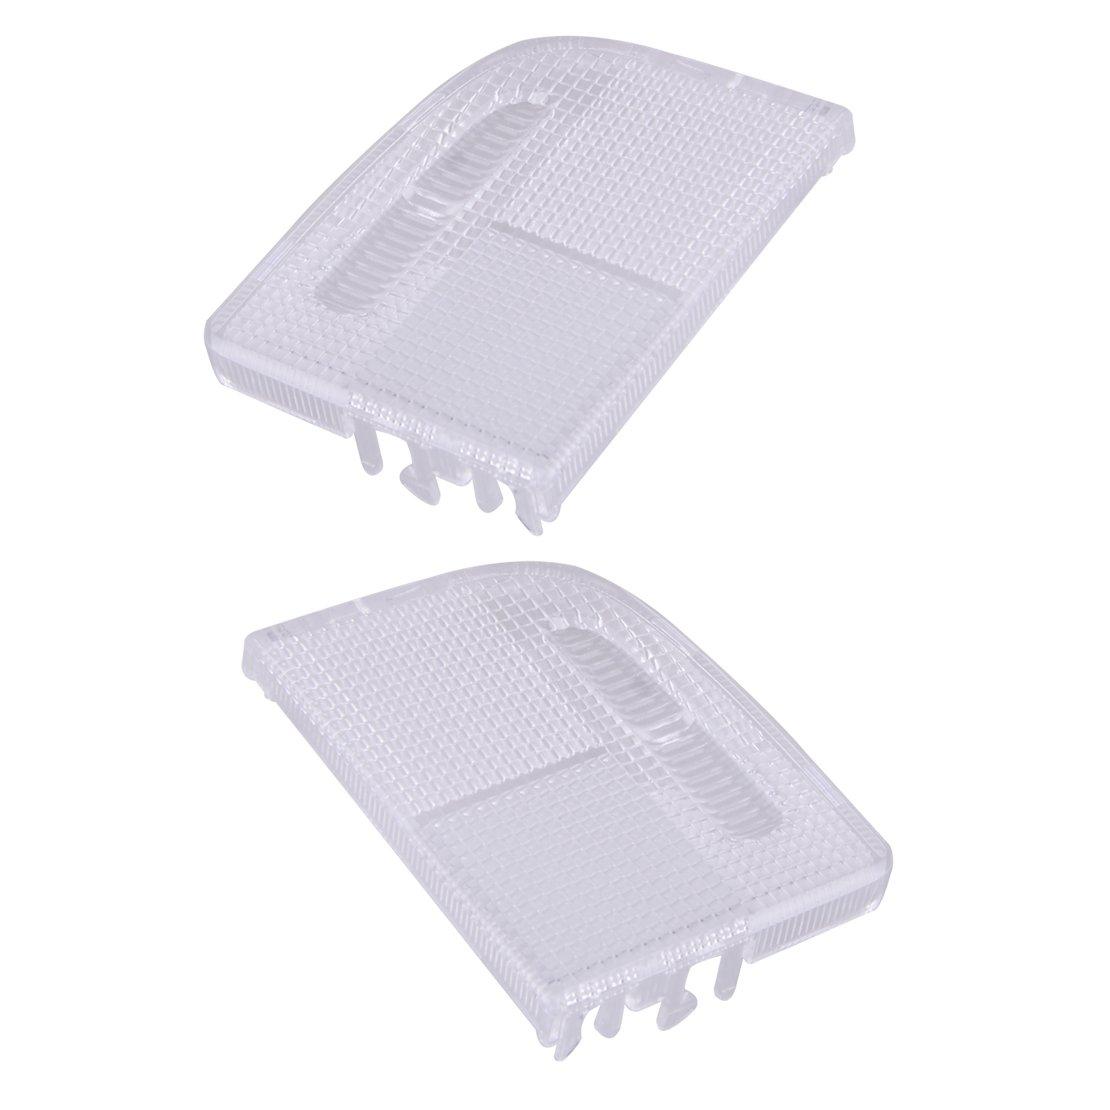 beler 2pcs Right Left Interior Roof Map Light Lens Fit for TSX Accord Civic Crosstour 34401-SDA-A21 34402-SDA-A21 hermeshine